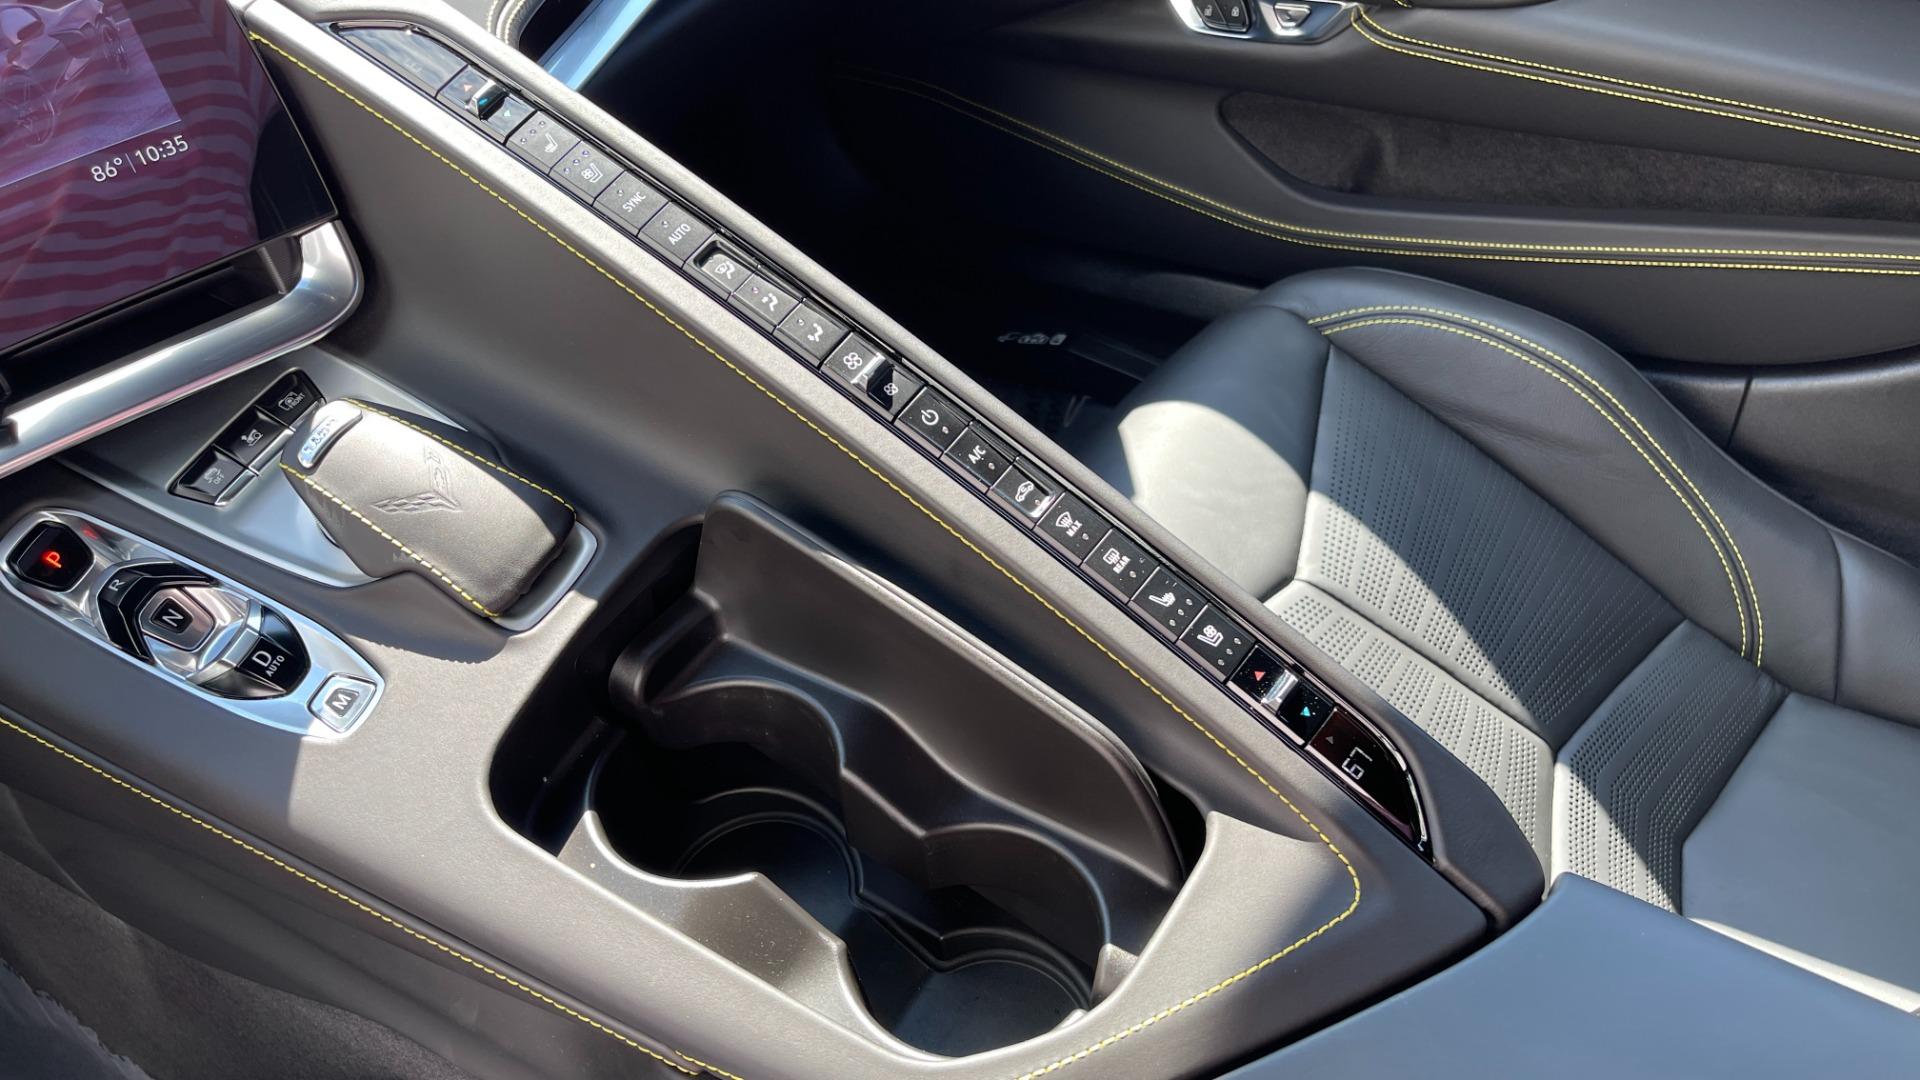 Used 2021 Chevrolet CORVETTE STINGRAY 3LT COUPE / 8-SPD / PERF PKG / NAV / BOSE / REARVIEW for sale $110,995 at Formula Imports in Charlotte NC 28227 37